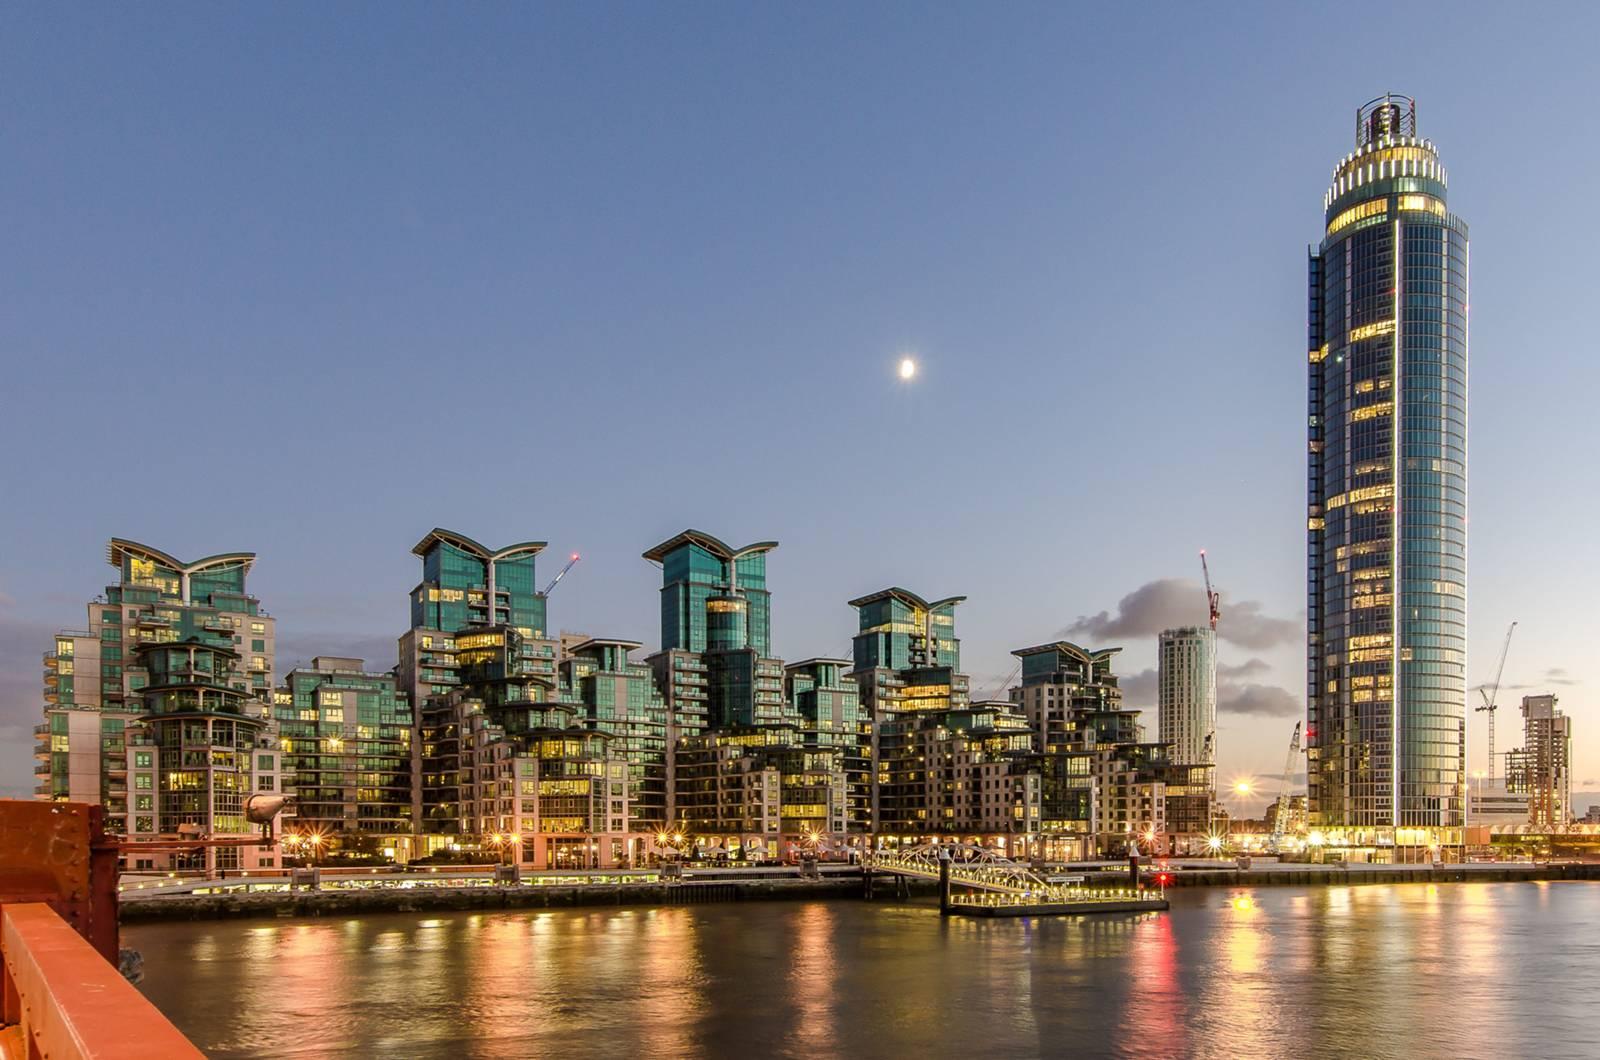 St George Wharf, Vauxhall, SW8, view